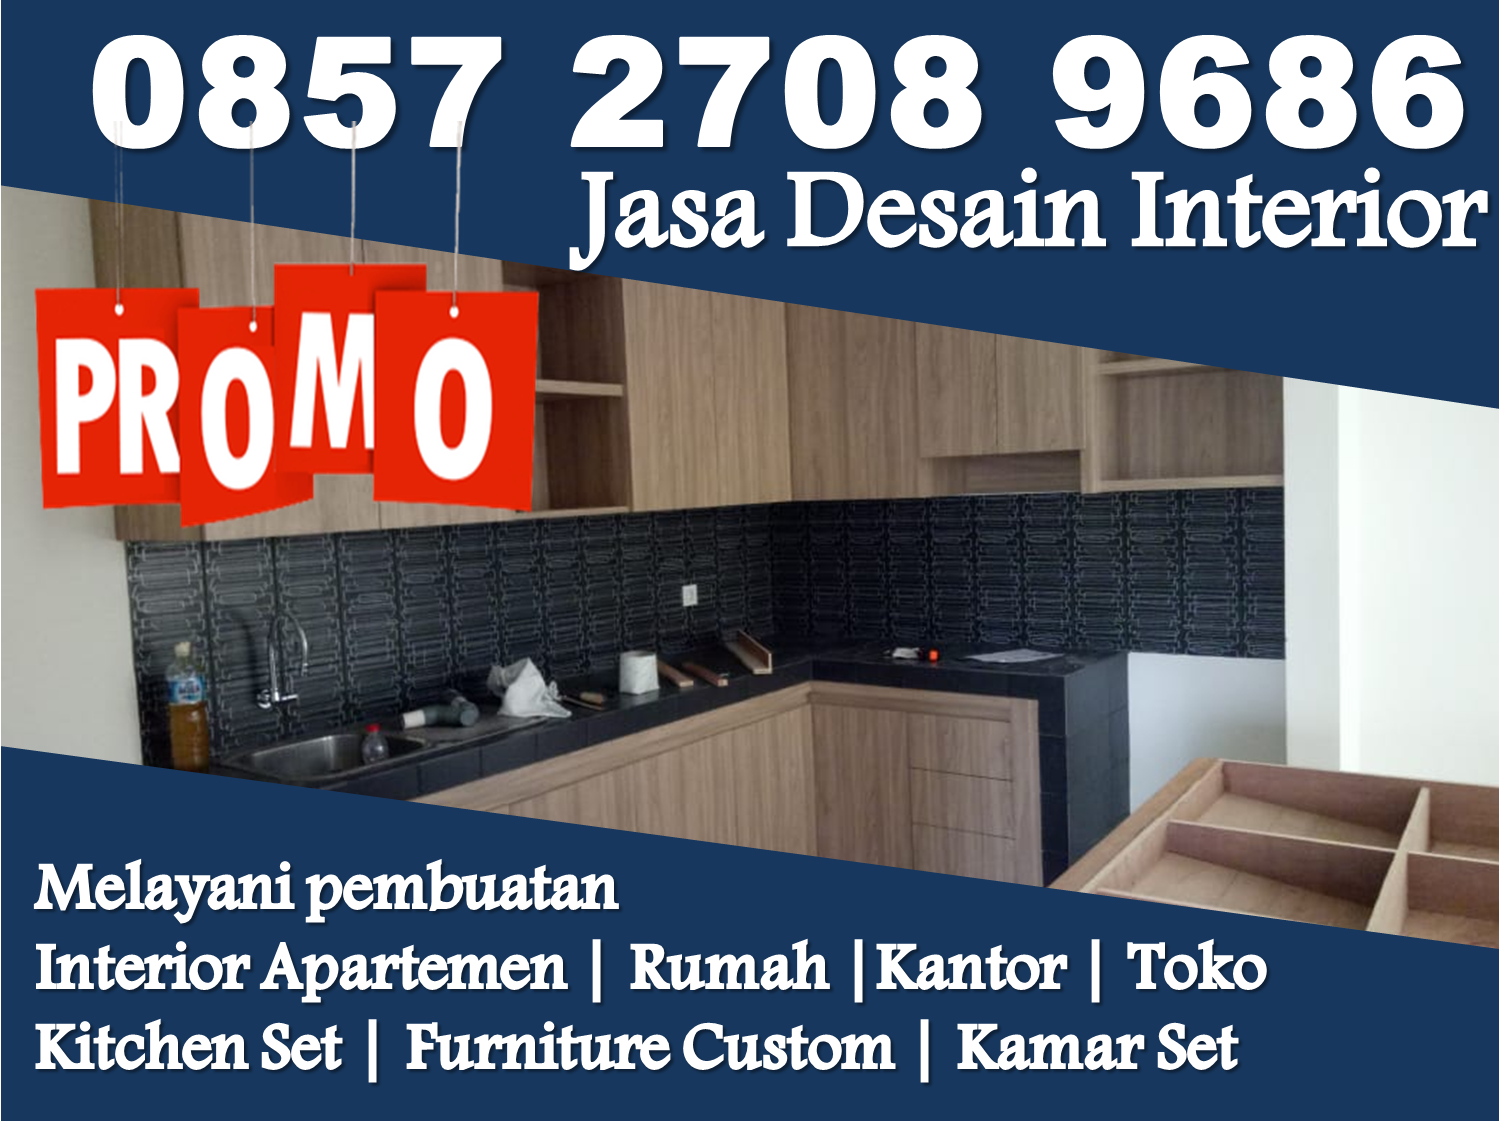 Jasa desain interior apartemen studio renovasi murah kamar mandi also rh pinterest